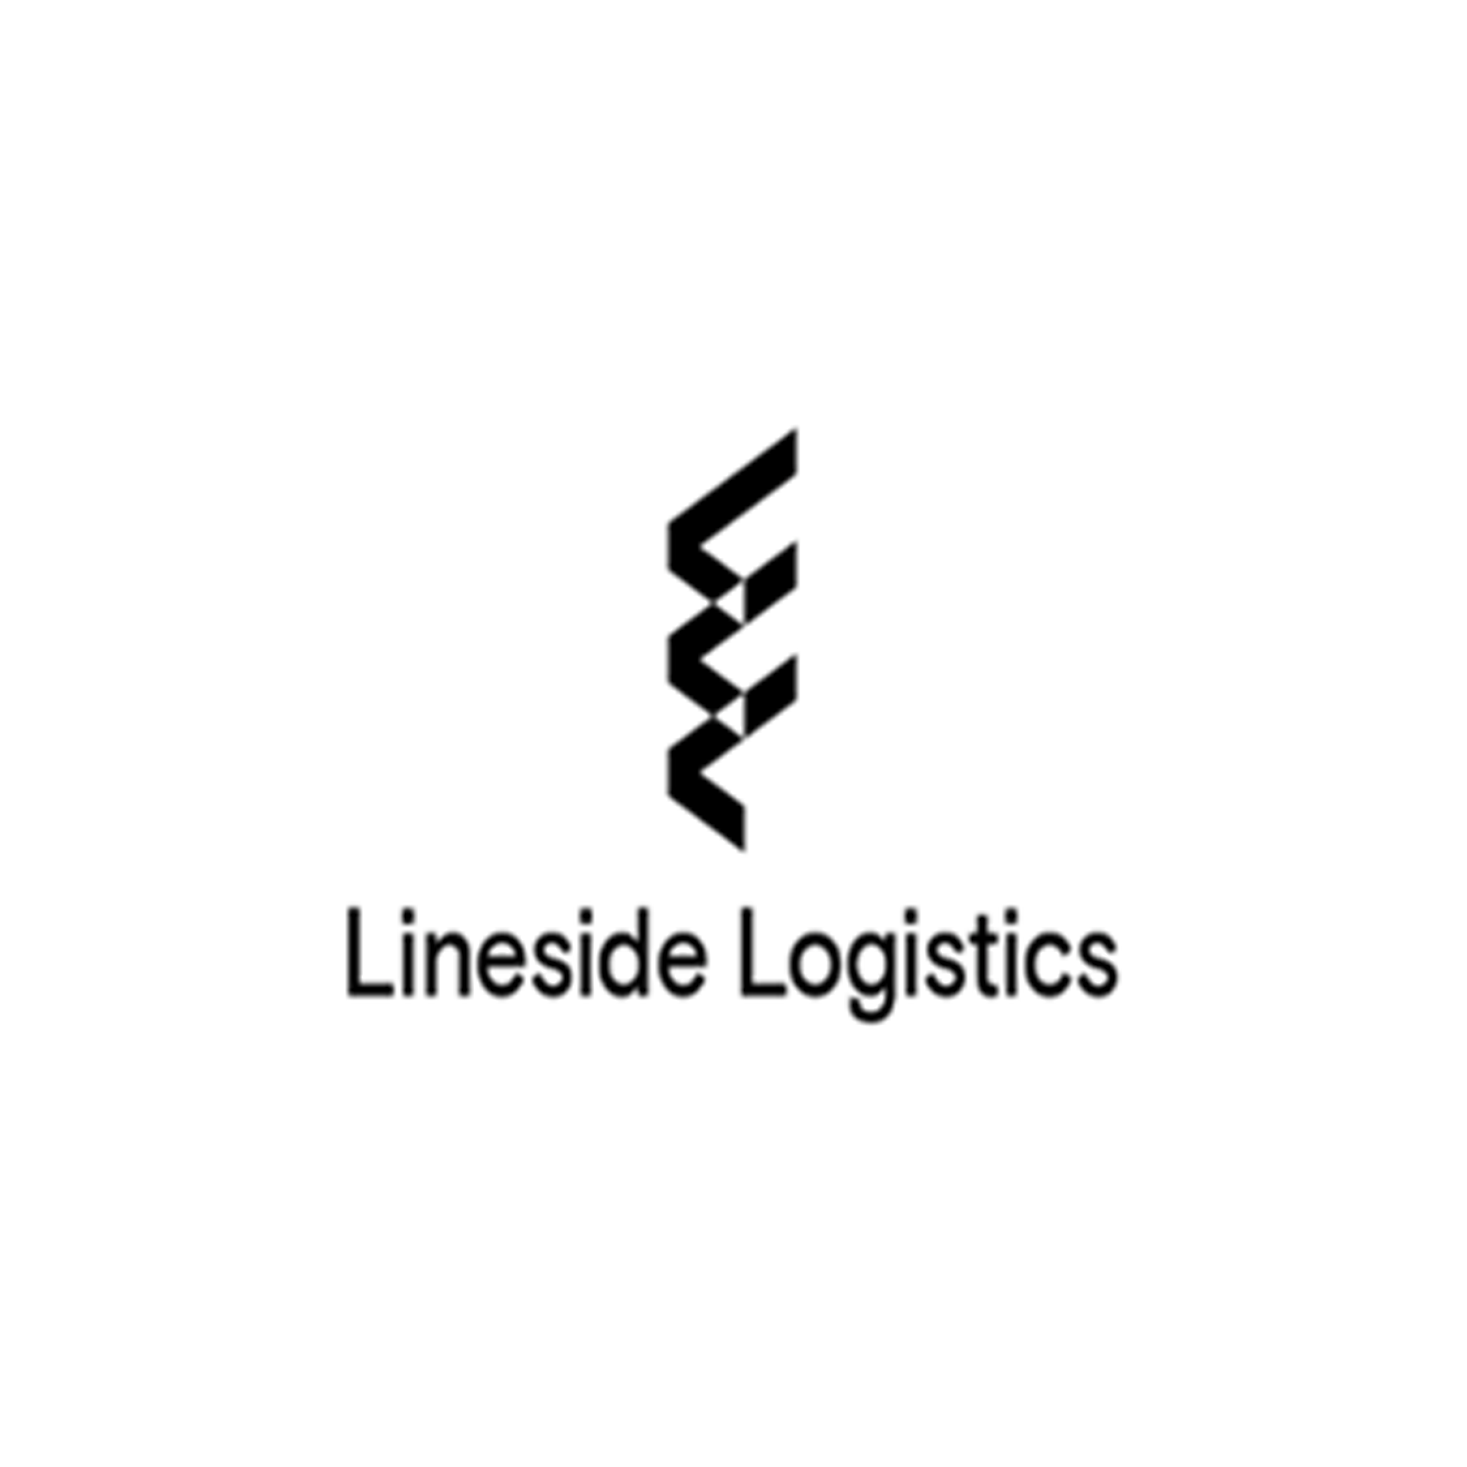 Lineside